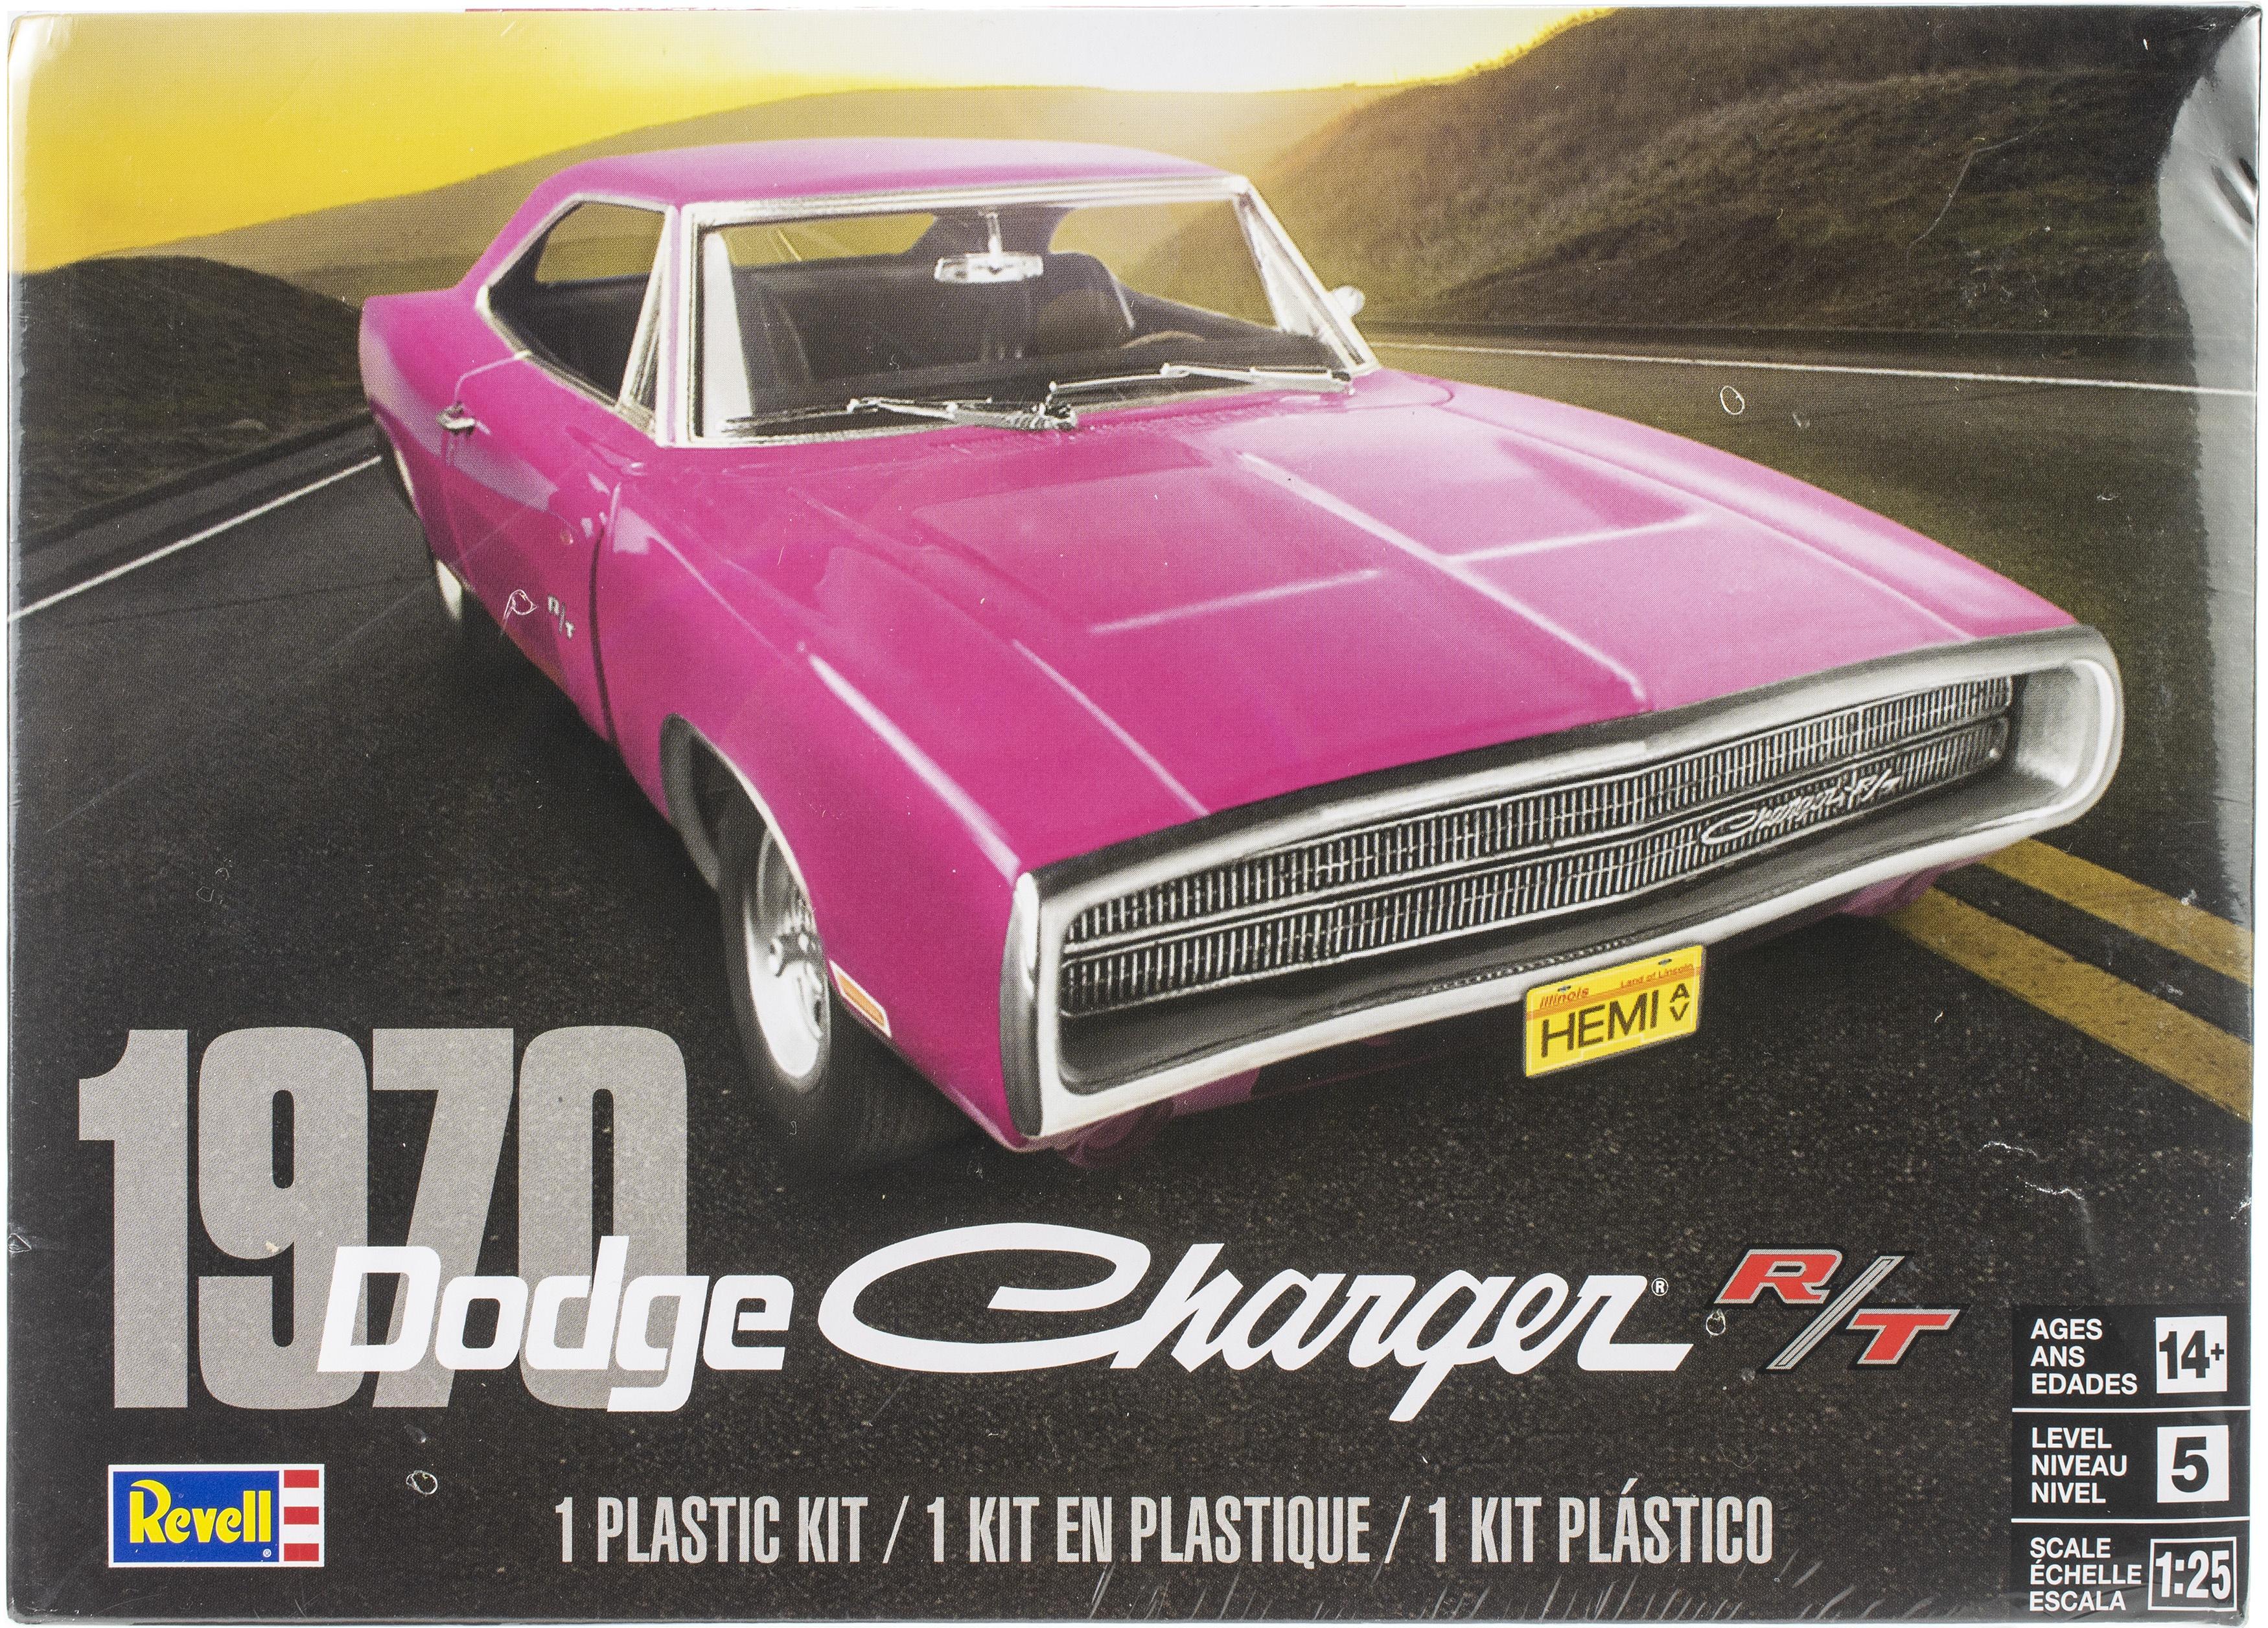 Plastic Model Kit-'70 Dodge Charger R/T 1:25